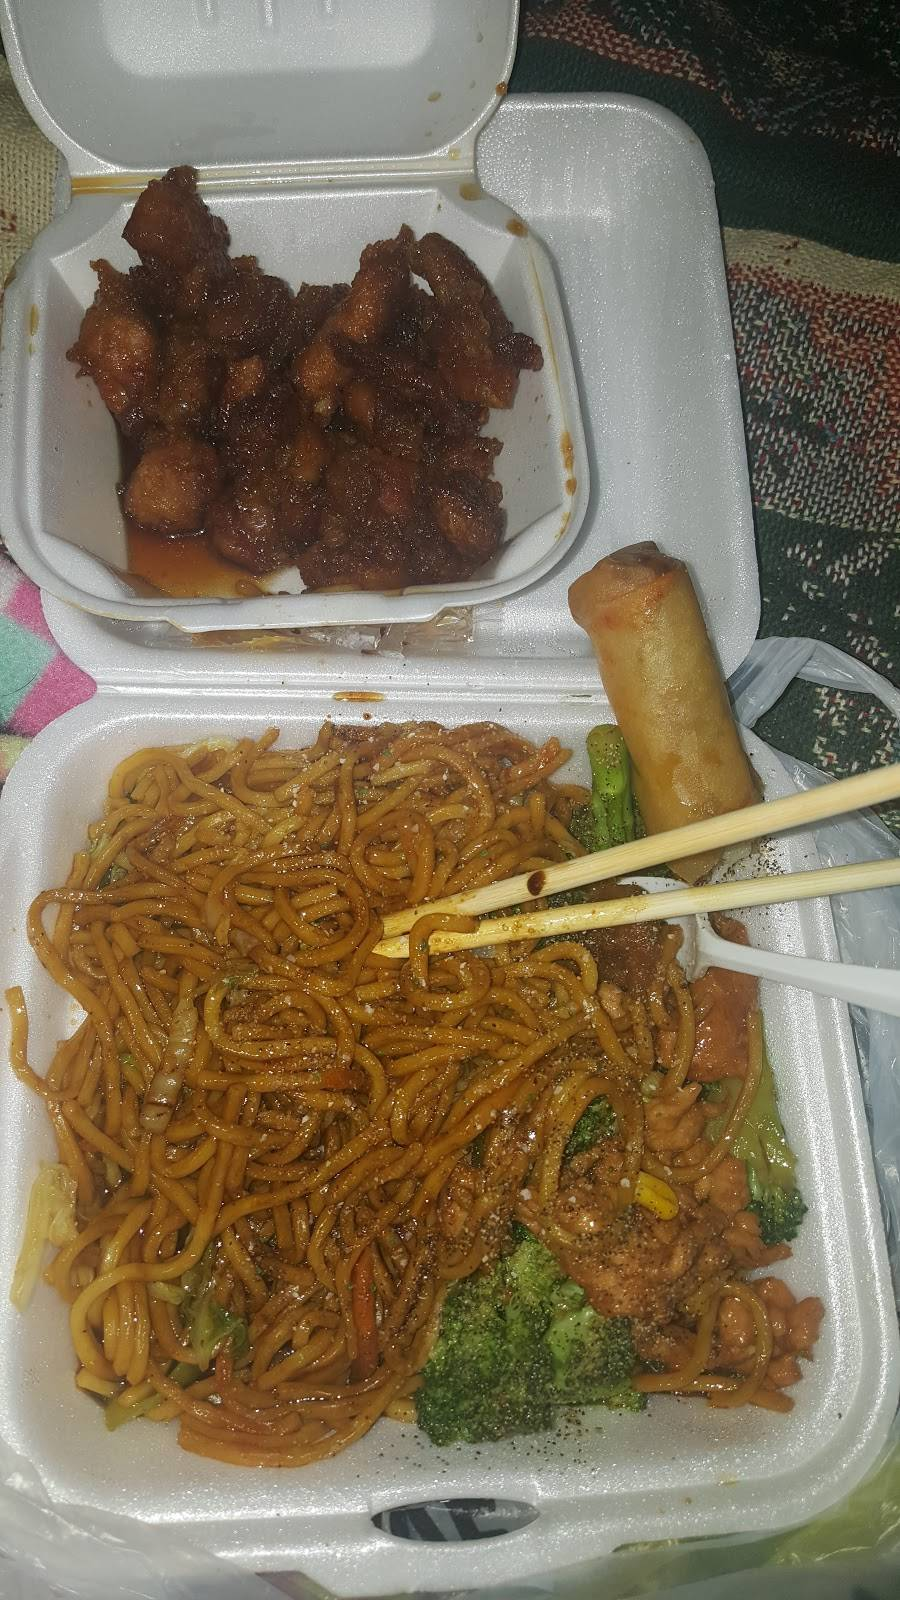 Panda Wok   restaurant   854 Cleveland Ave, Atlanta, GA 30344, USA   4047681612 OR +1 404-768-1612